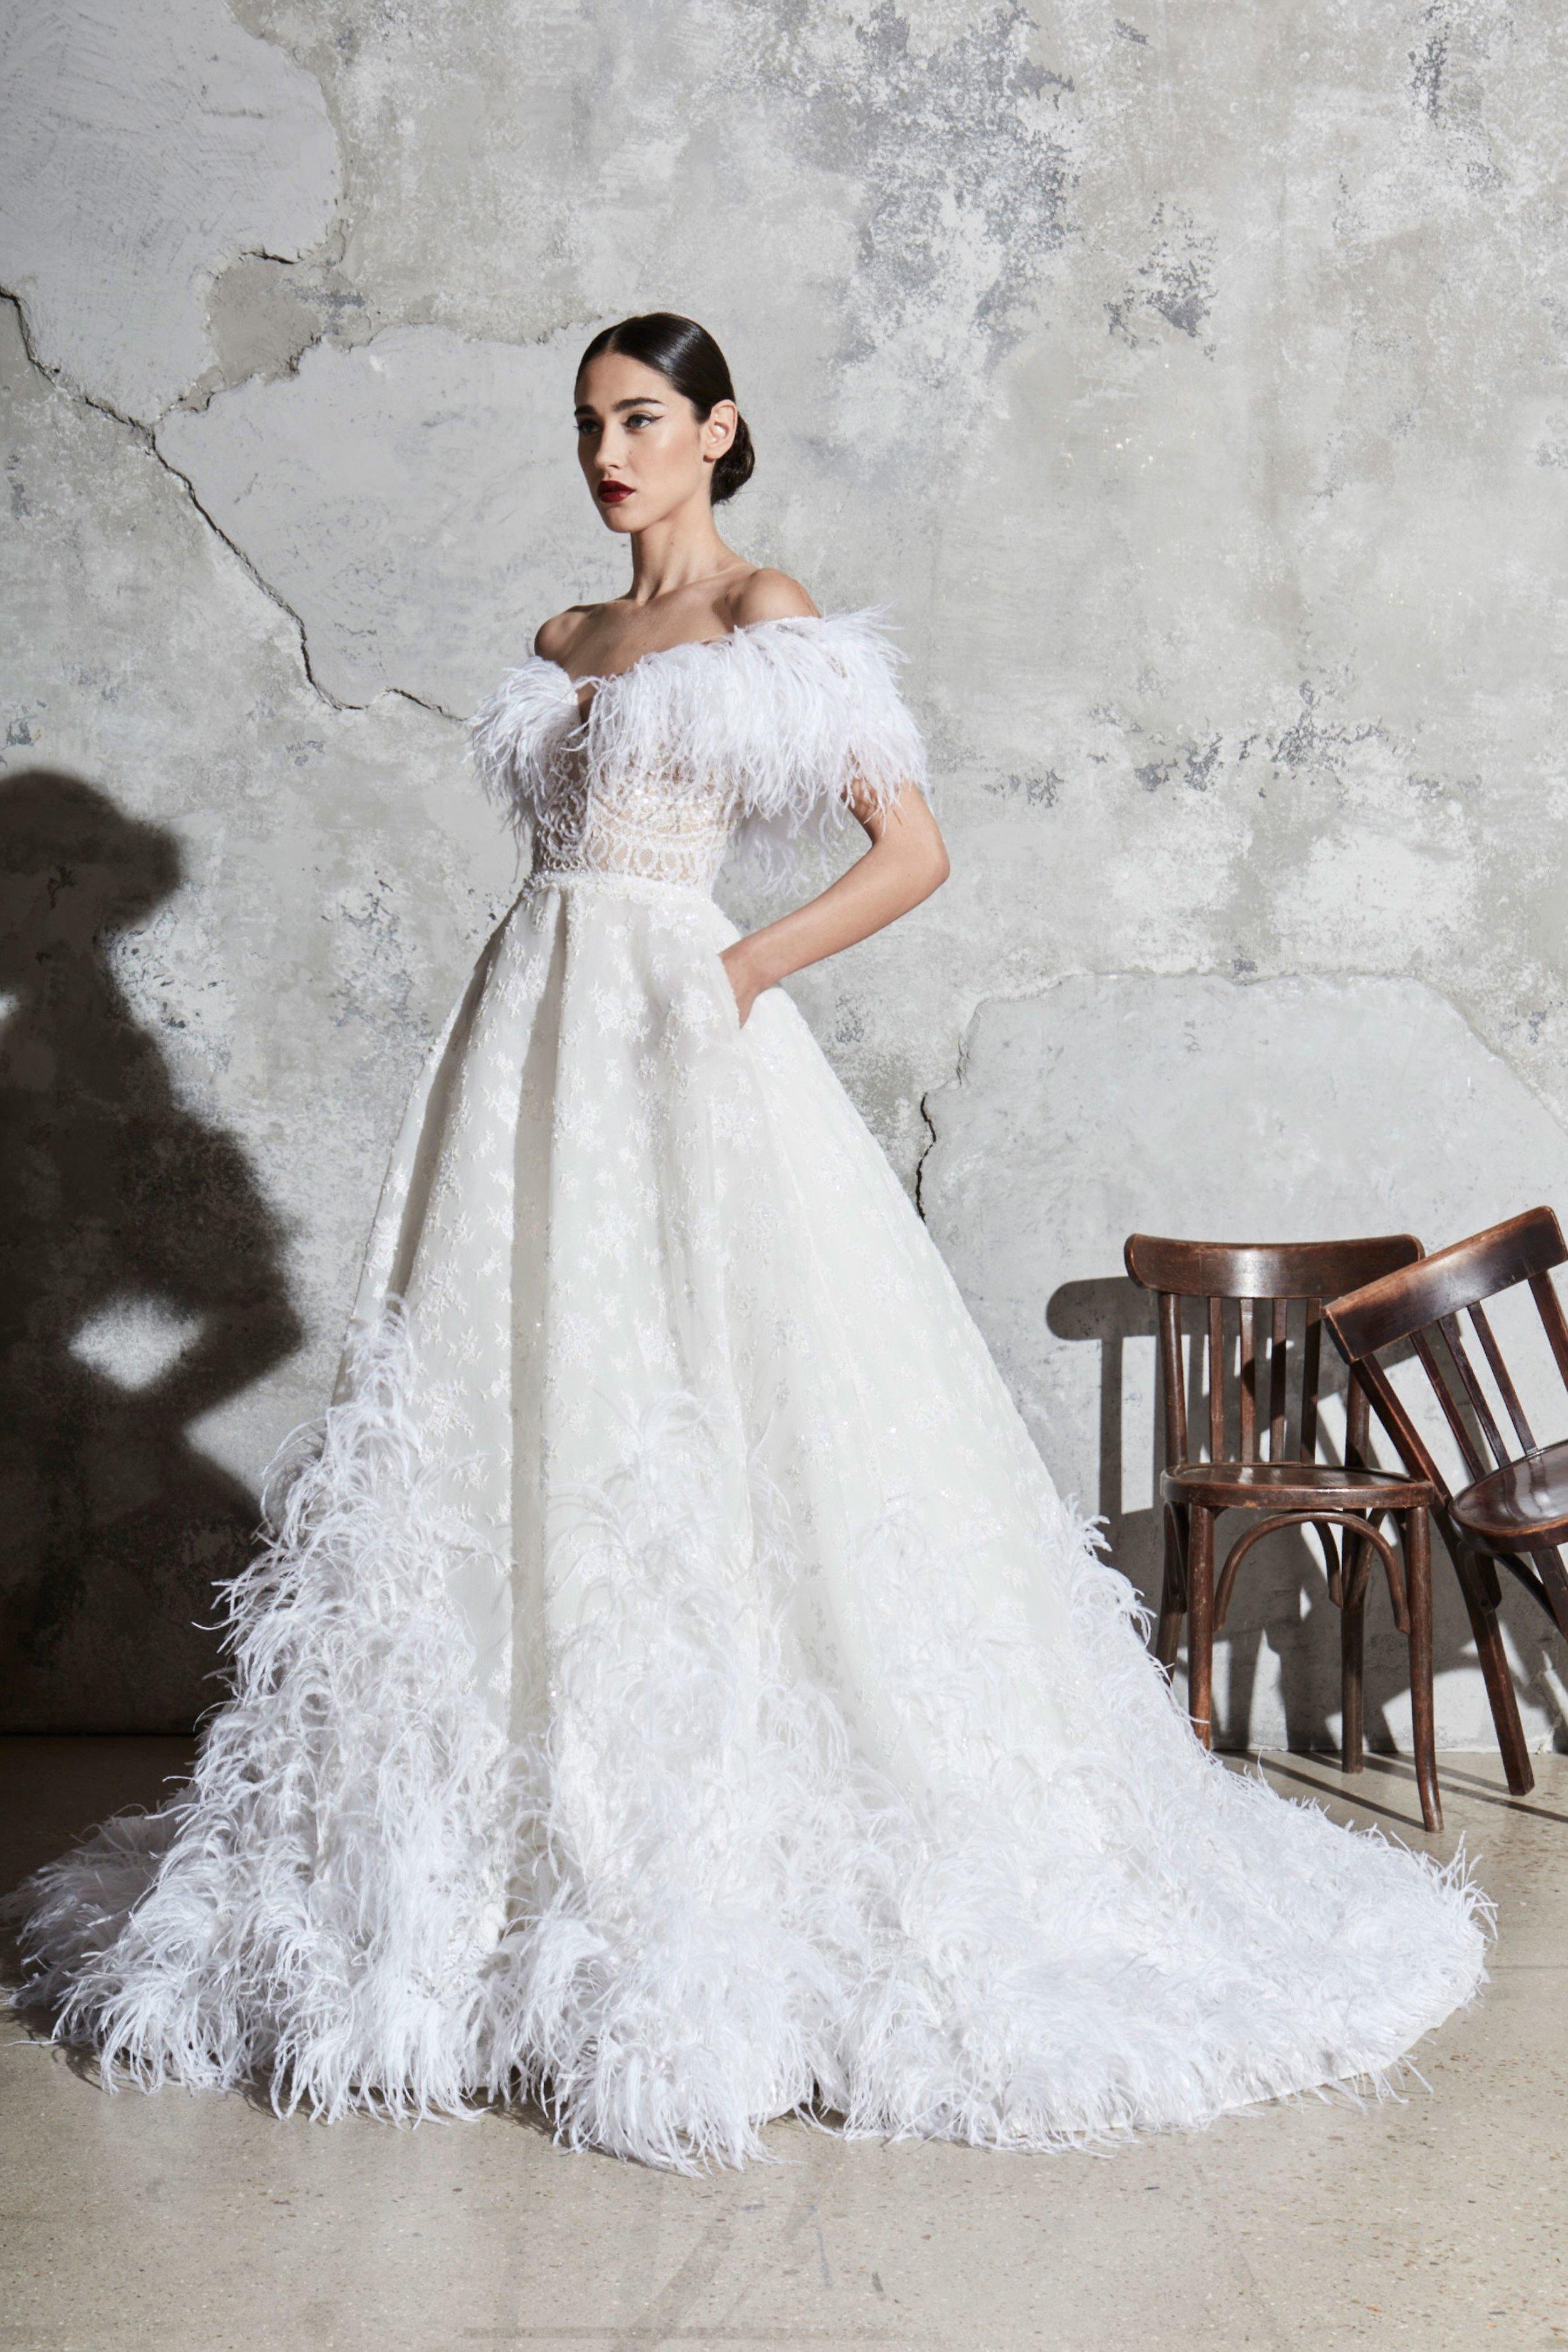 00007-zuhair-murad-new-york-bridal-Spring-2020-CREDIT-Thomas-Nutzl.jpg